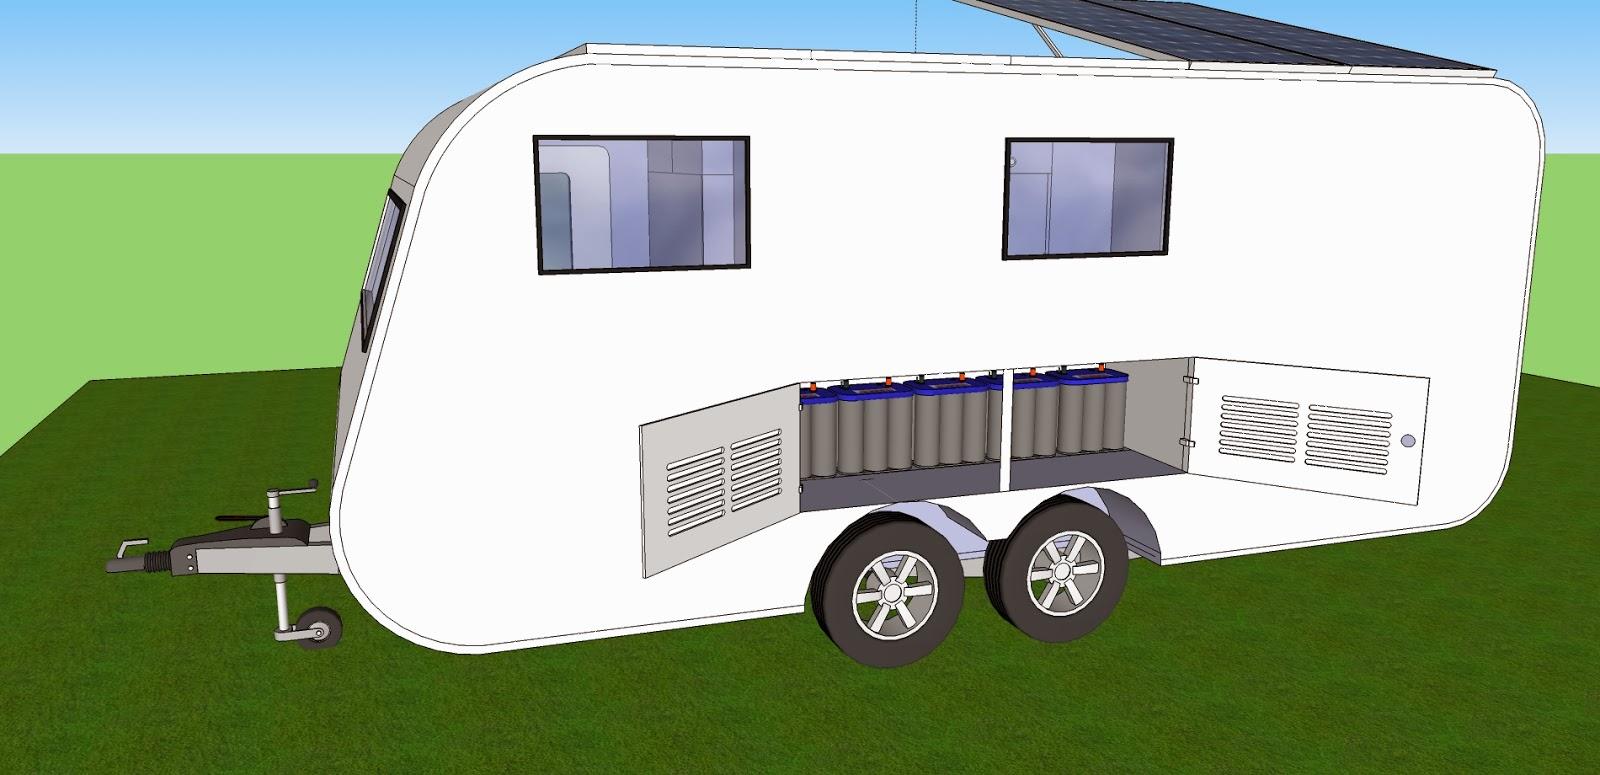 tracker trailer wiring diagram images wiring diagram and pin karavan boat trailer wiring diagram nilzanet